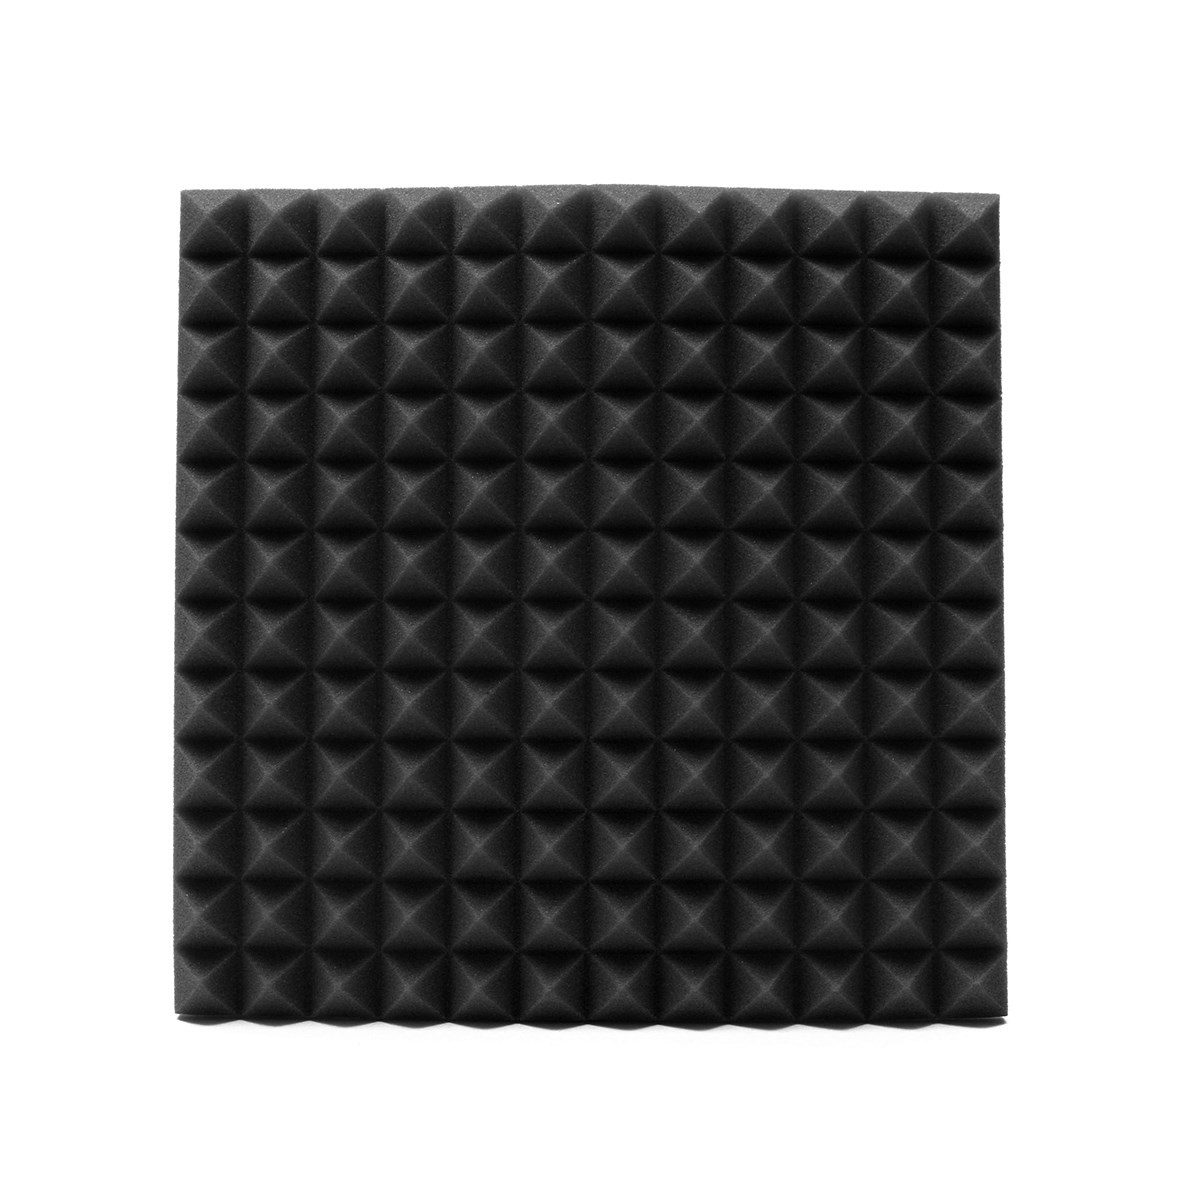 45x45x3cm Black Soundproofing Foam Acoustic Foam Sound Treatment Absorption Wedge Tiles Pack Studio/Music sound absorption coefficient analysis